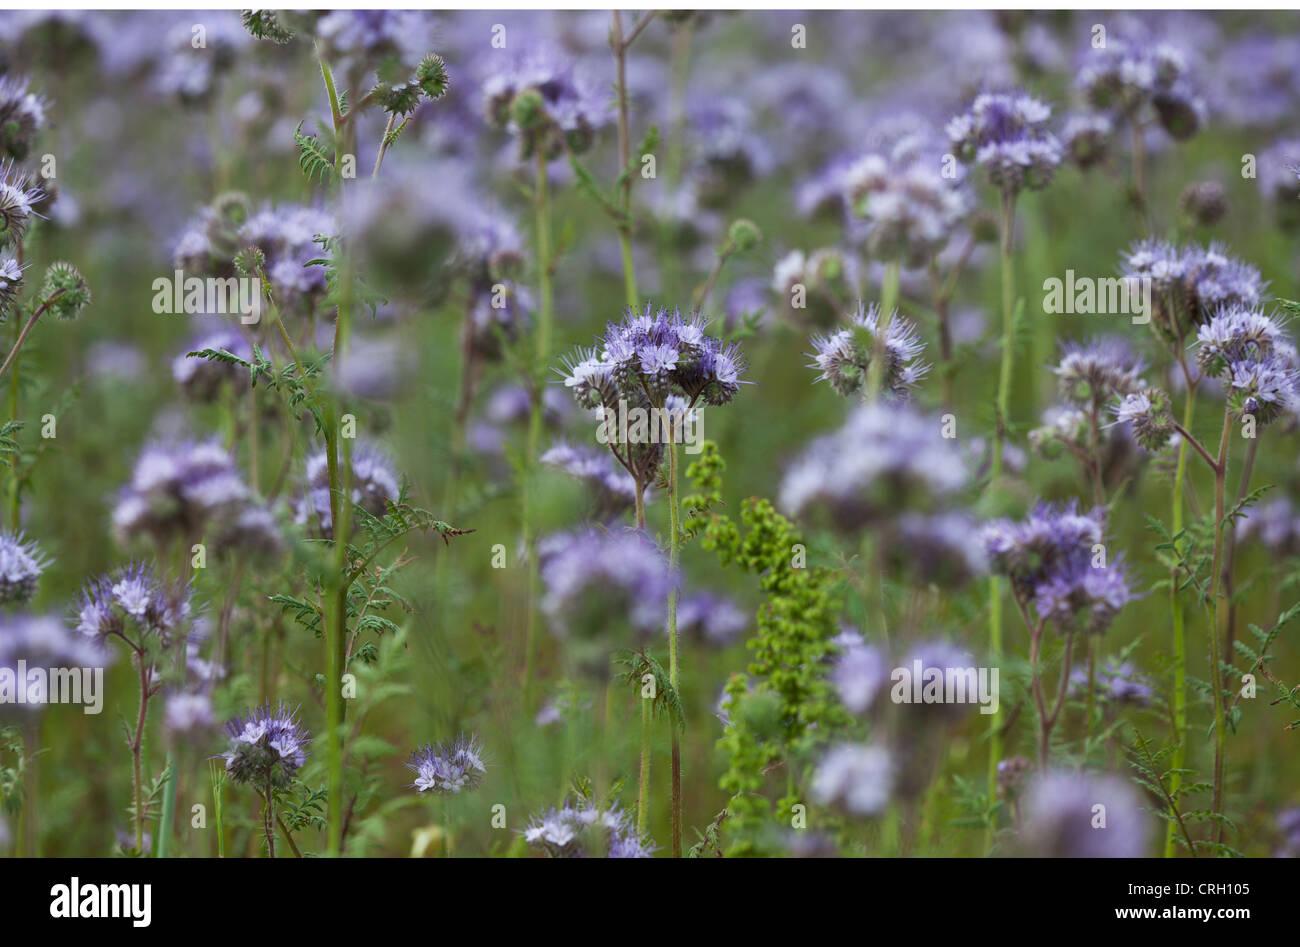 Phacelia tanacetifolia scorpion weed abundant purple flower stock phacelia tanacetifolia scorpion weed abundant purple flower clusters on long green stems mightylinksfo